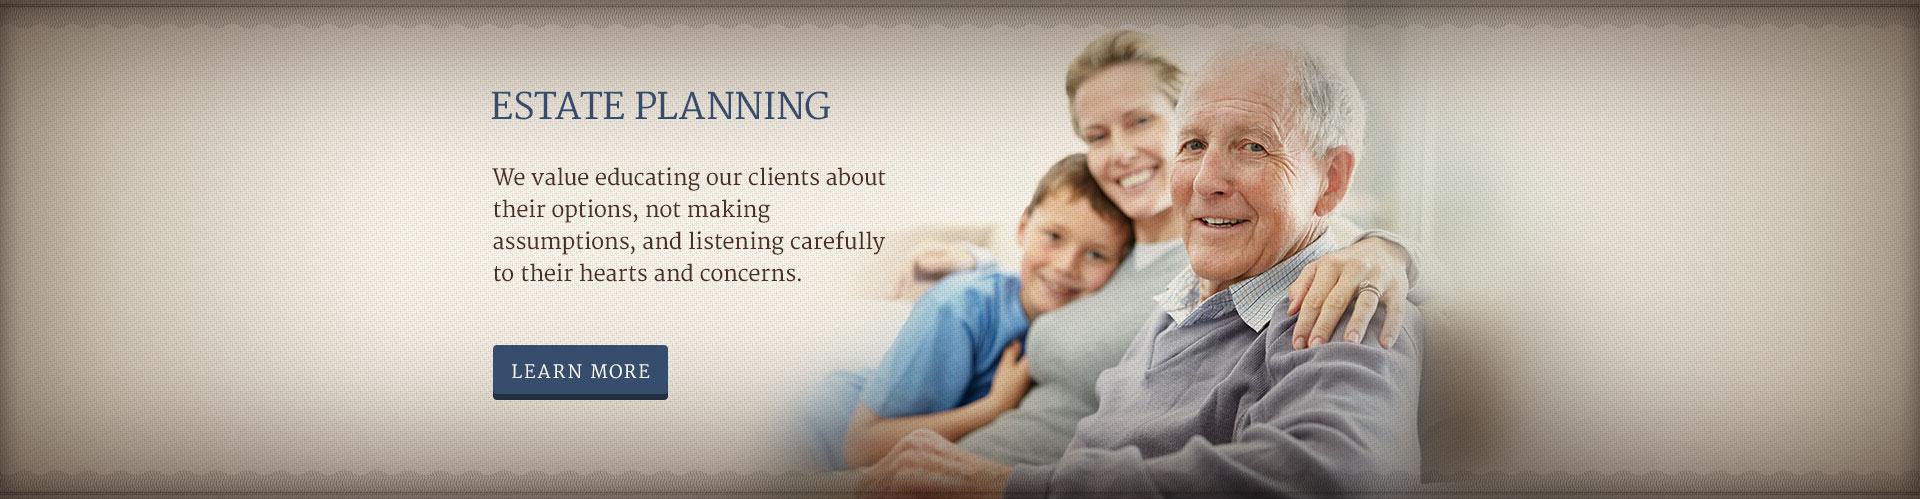 banner-estate-planning